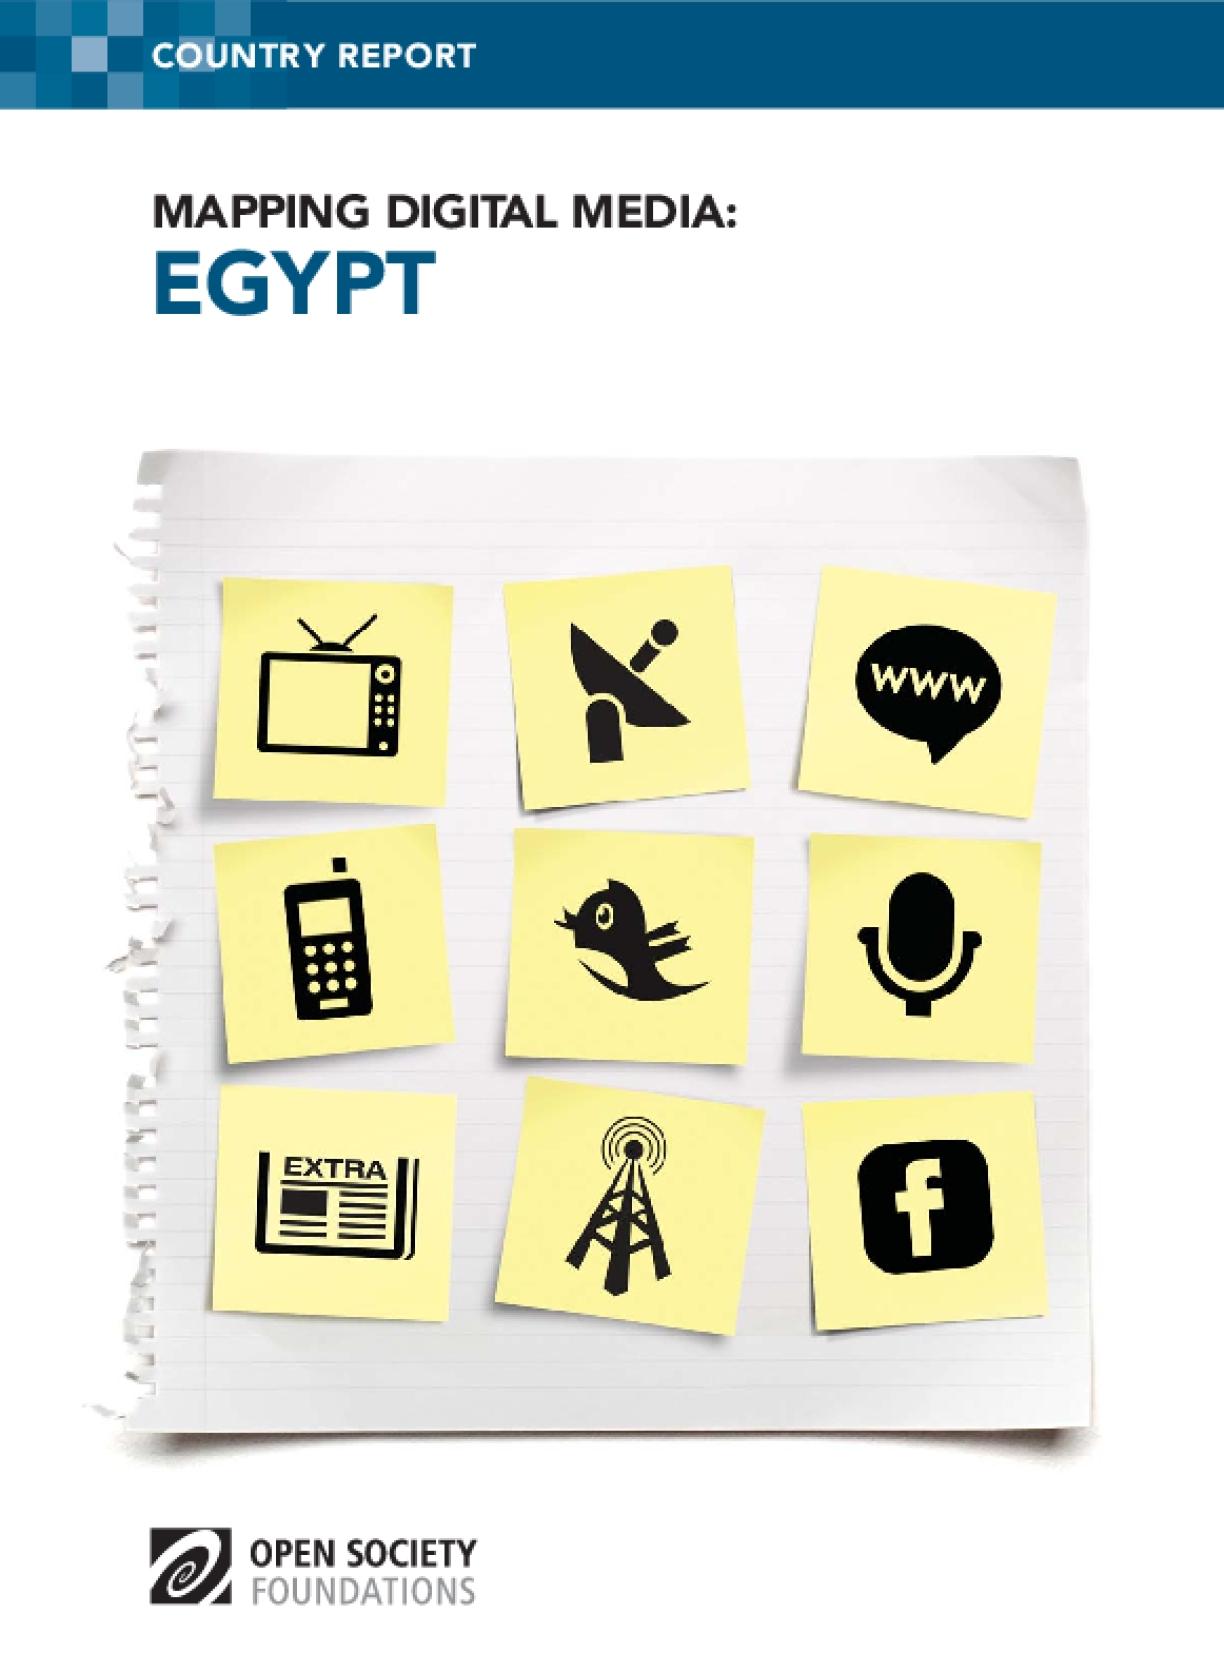 Mapping Digital Media: Egypt